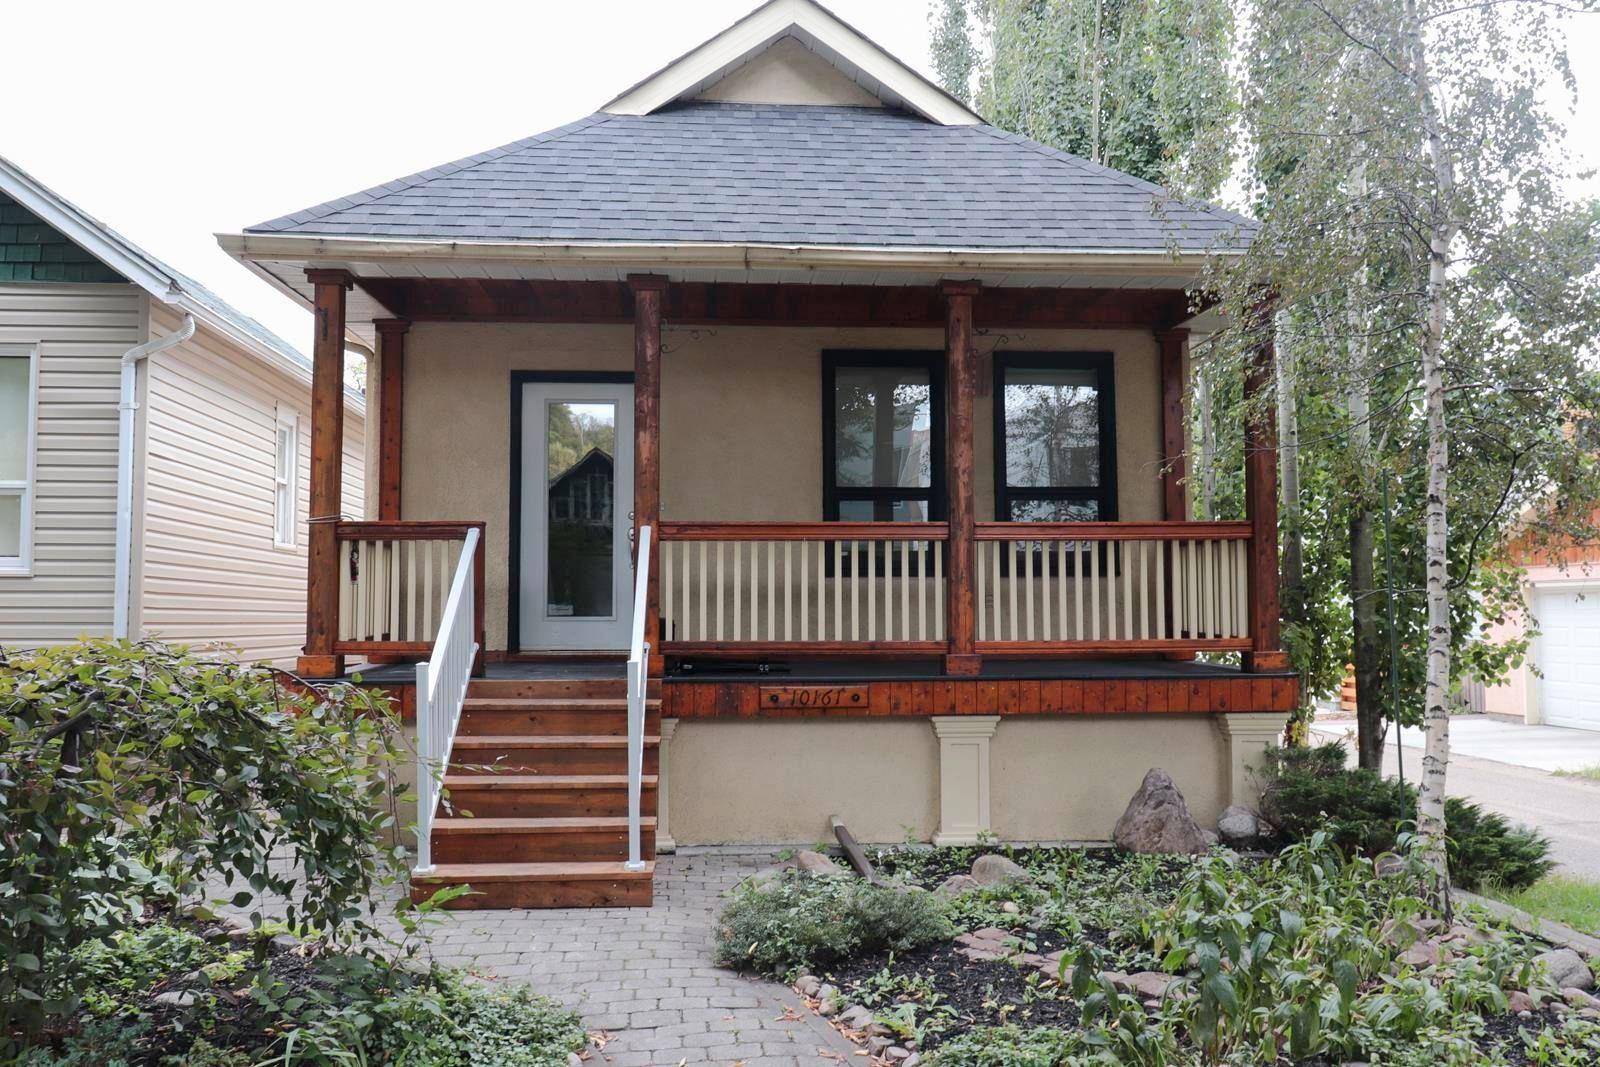 Main Photo: 10161 92 Street in Edmonton: Zone 13 House for sale : MLS®# E4262113